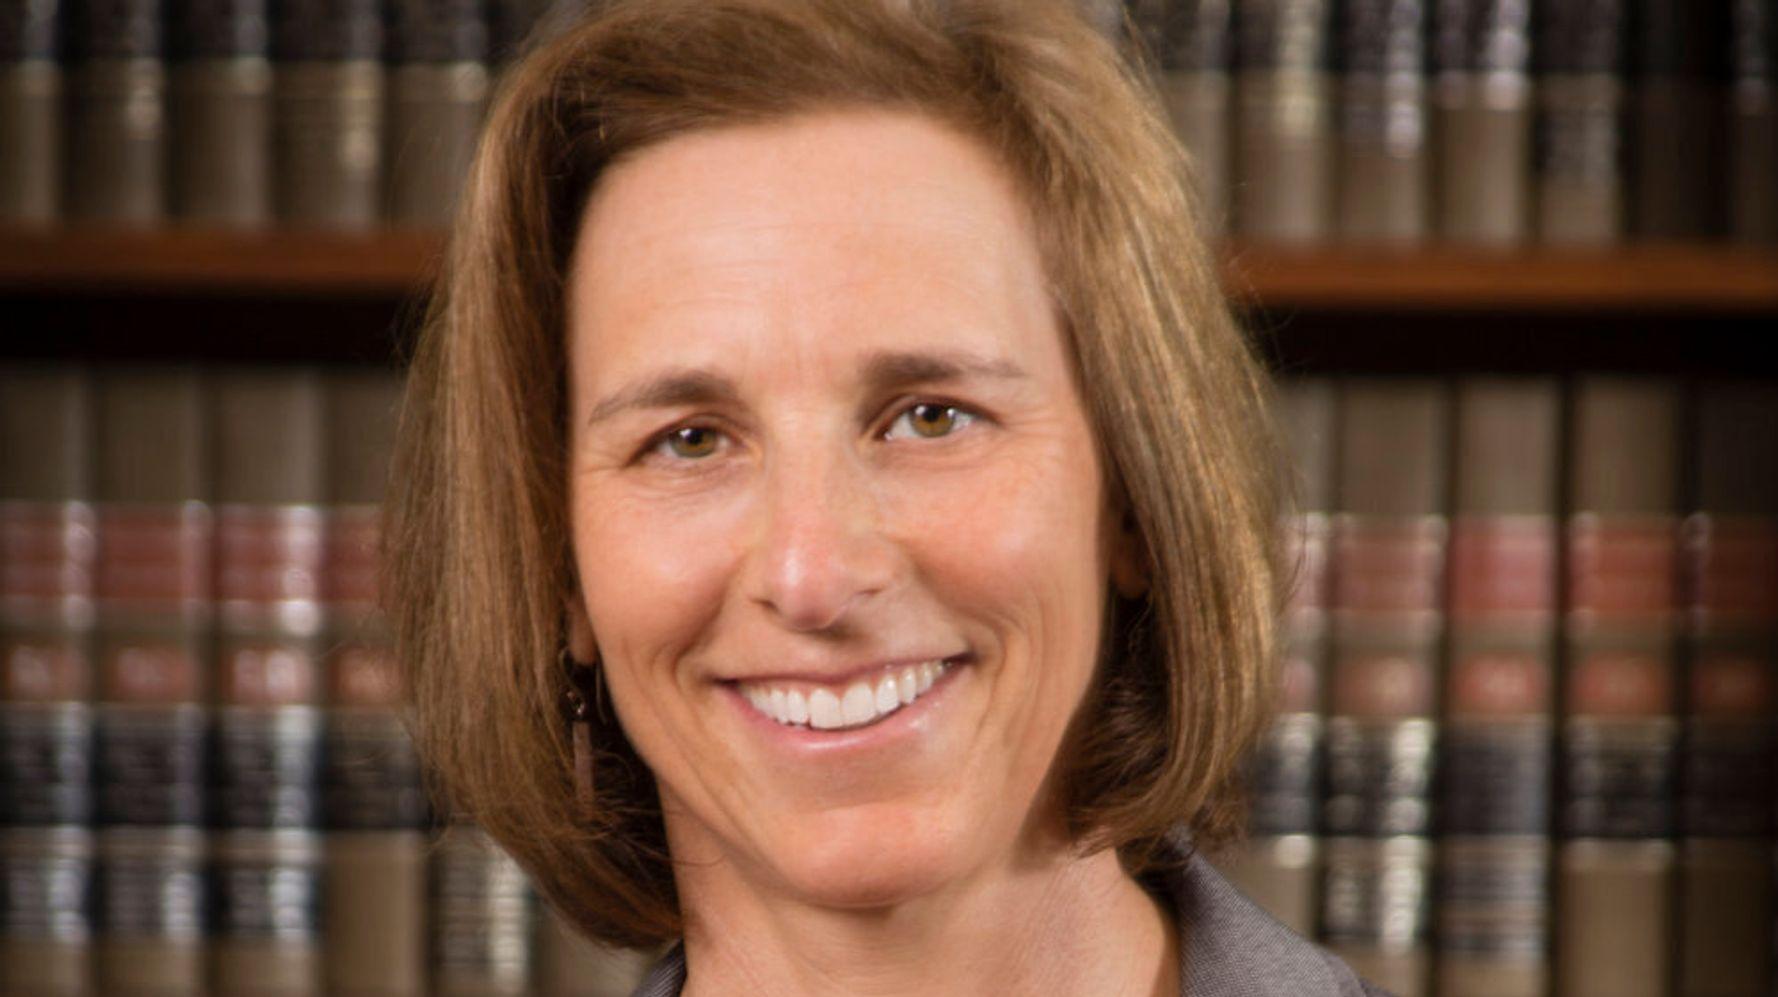 New Wisconsin Justice Sworn In During 100-Mile Ultramarathon